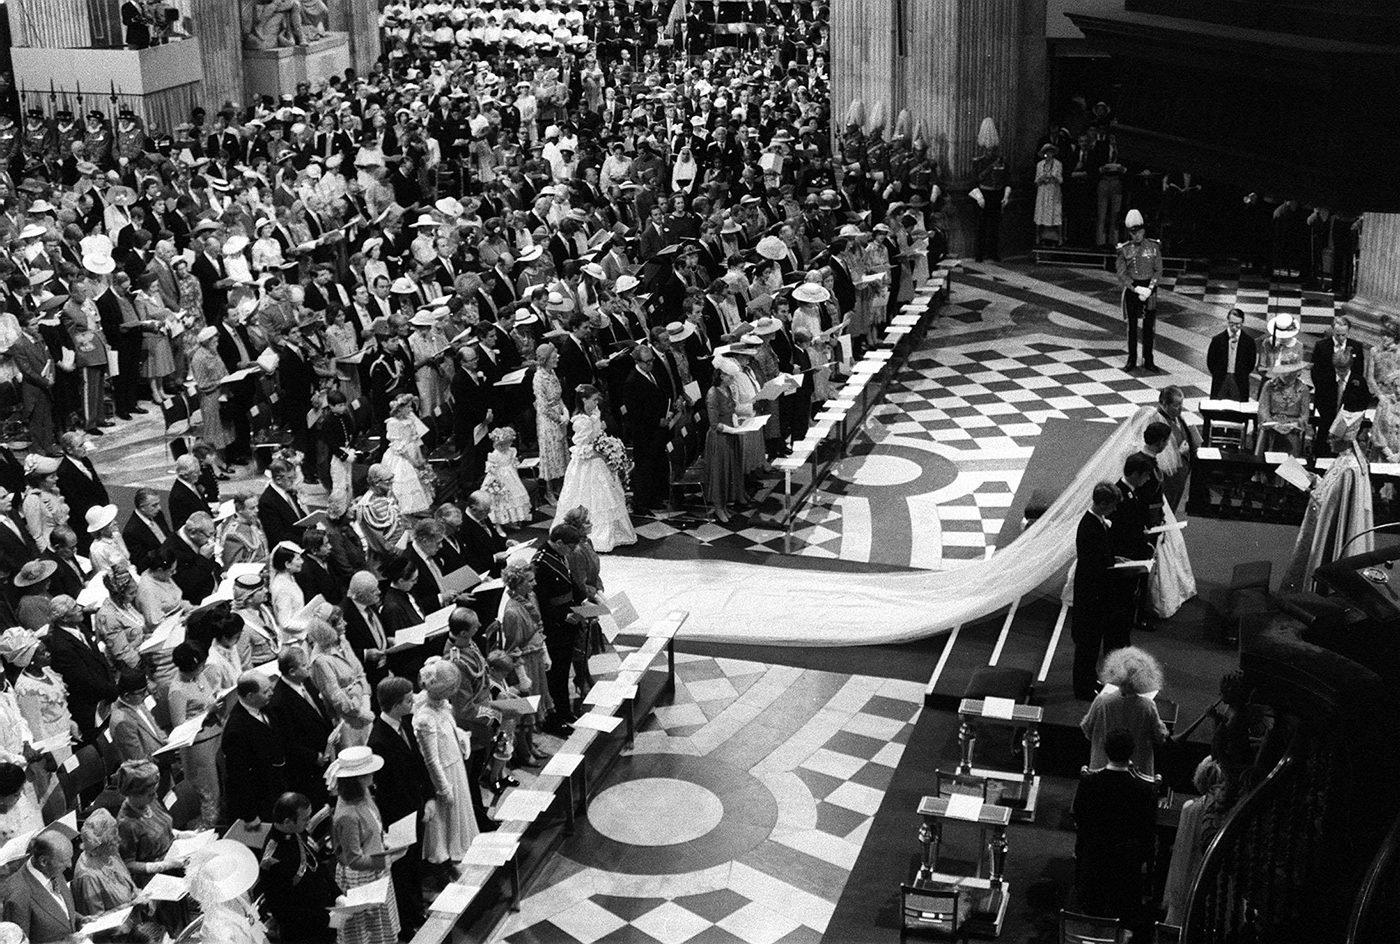 Prince Charles and Princess Diana wedding guests